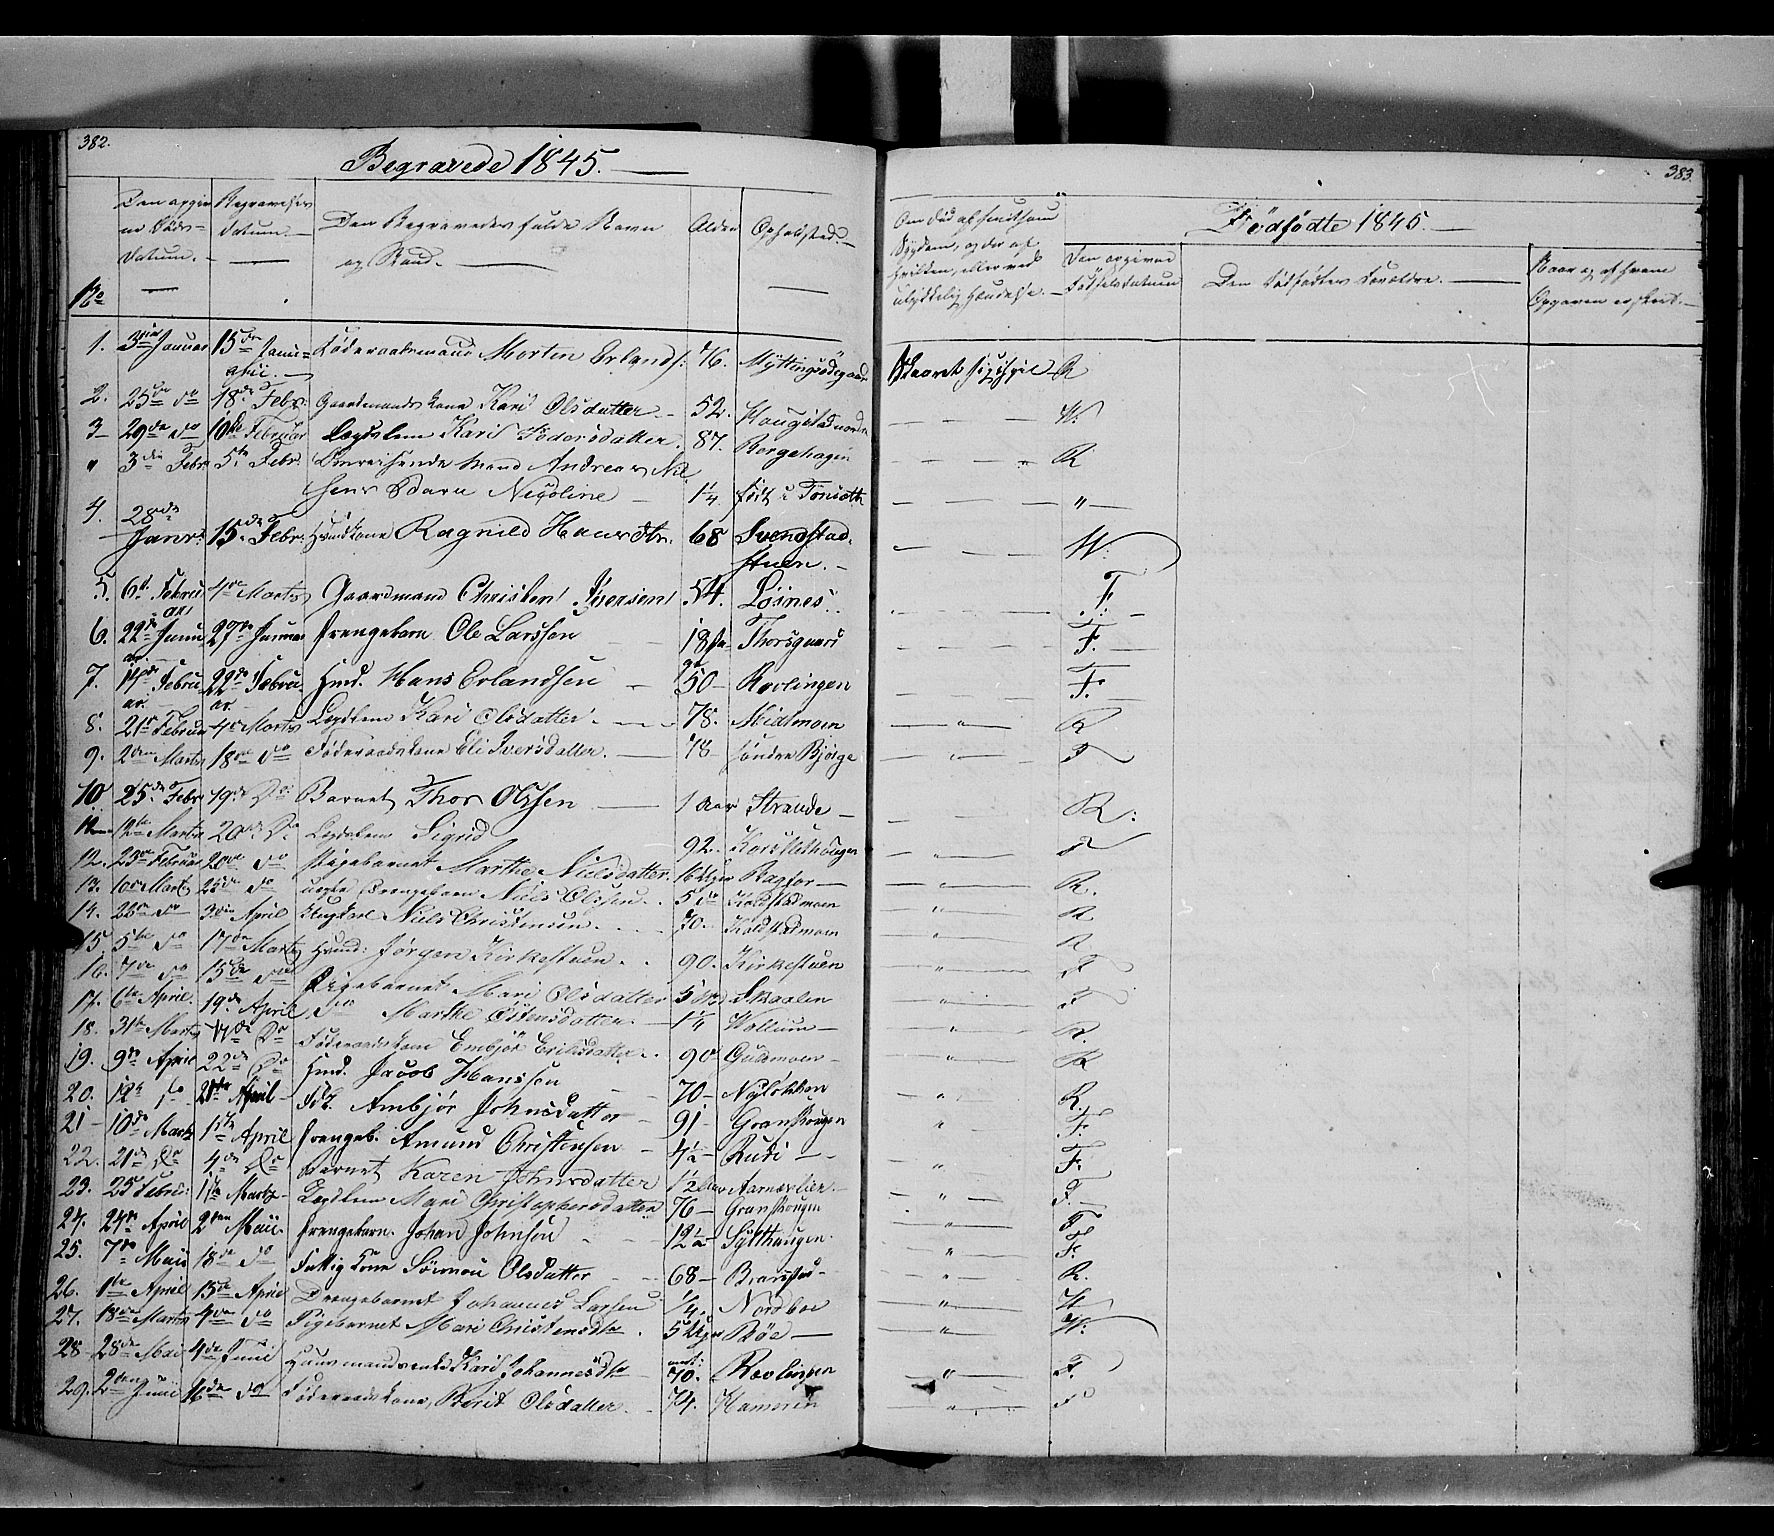 SAH, Ringebu prestekontor, Ministerialbok nr. 5, 1839-1848, s. 382-383